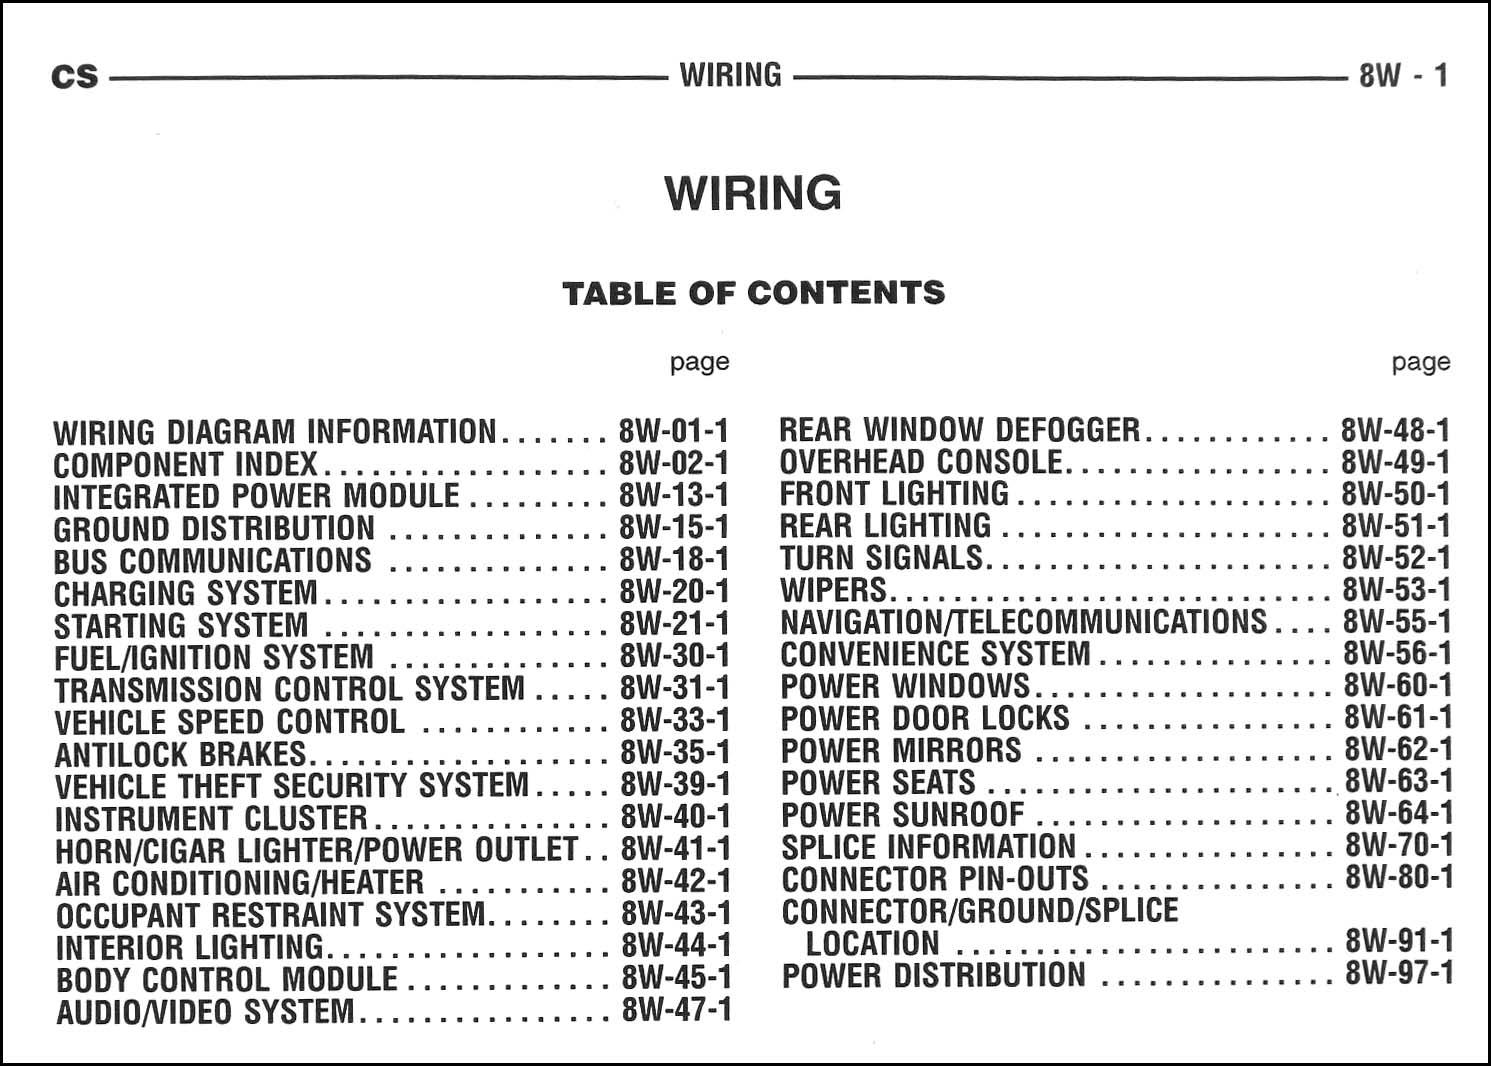 Wiring Diagrams 63 Model Year